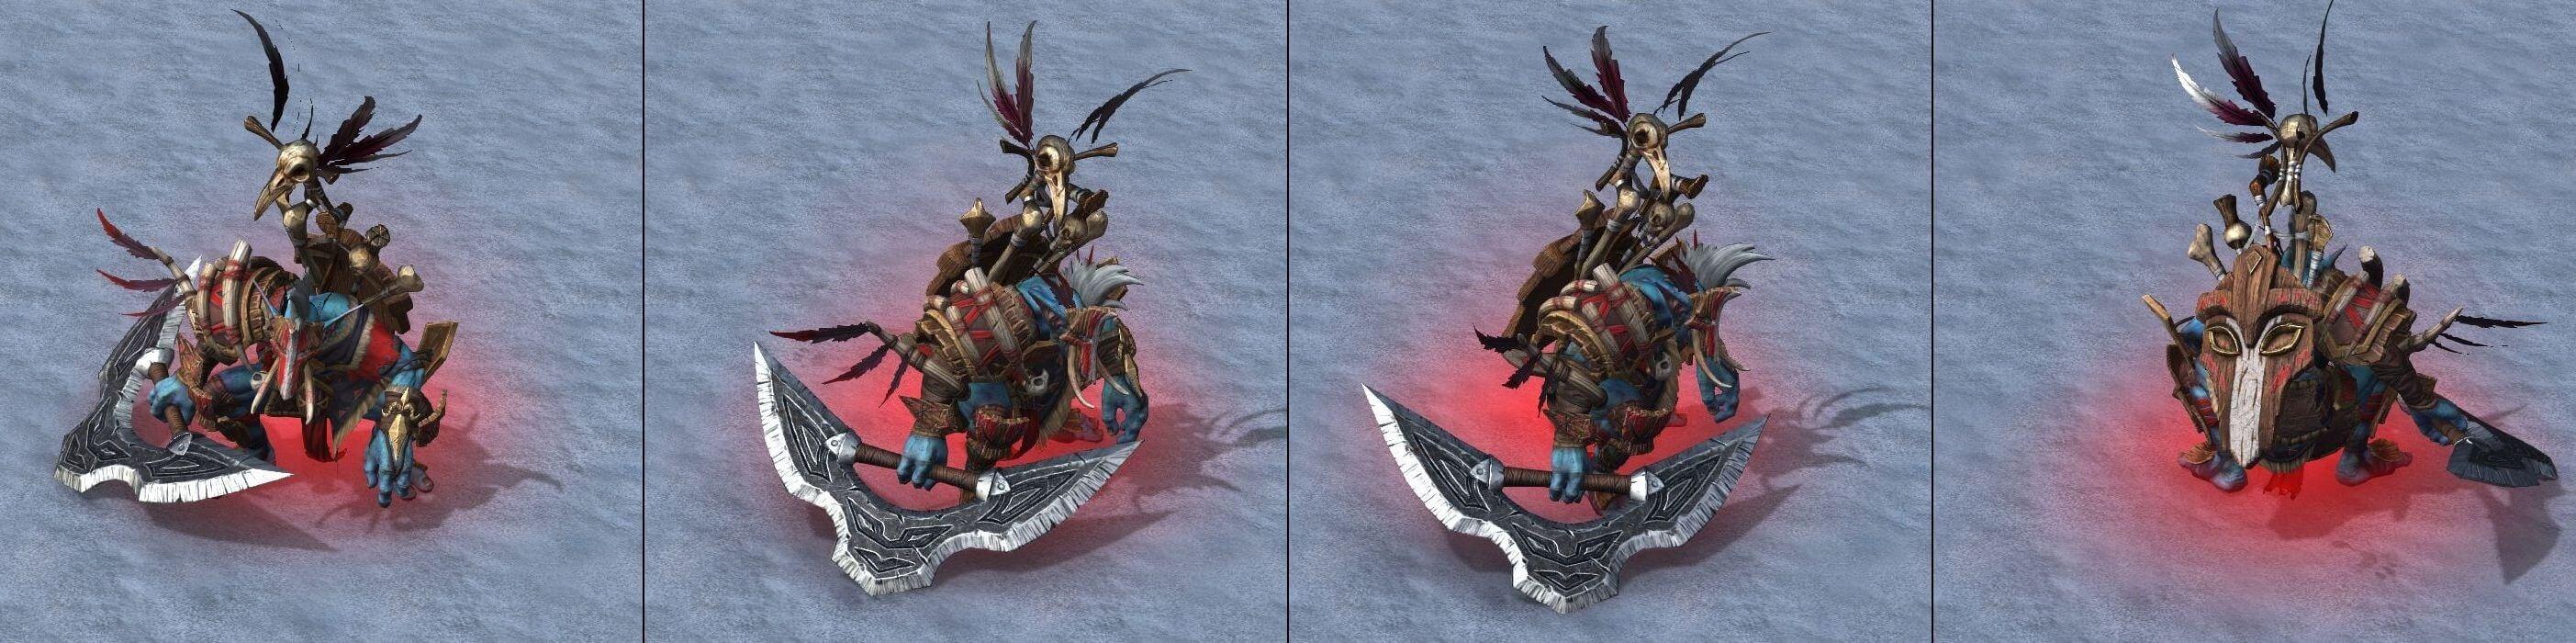 Ловец духов Warcraft lll